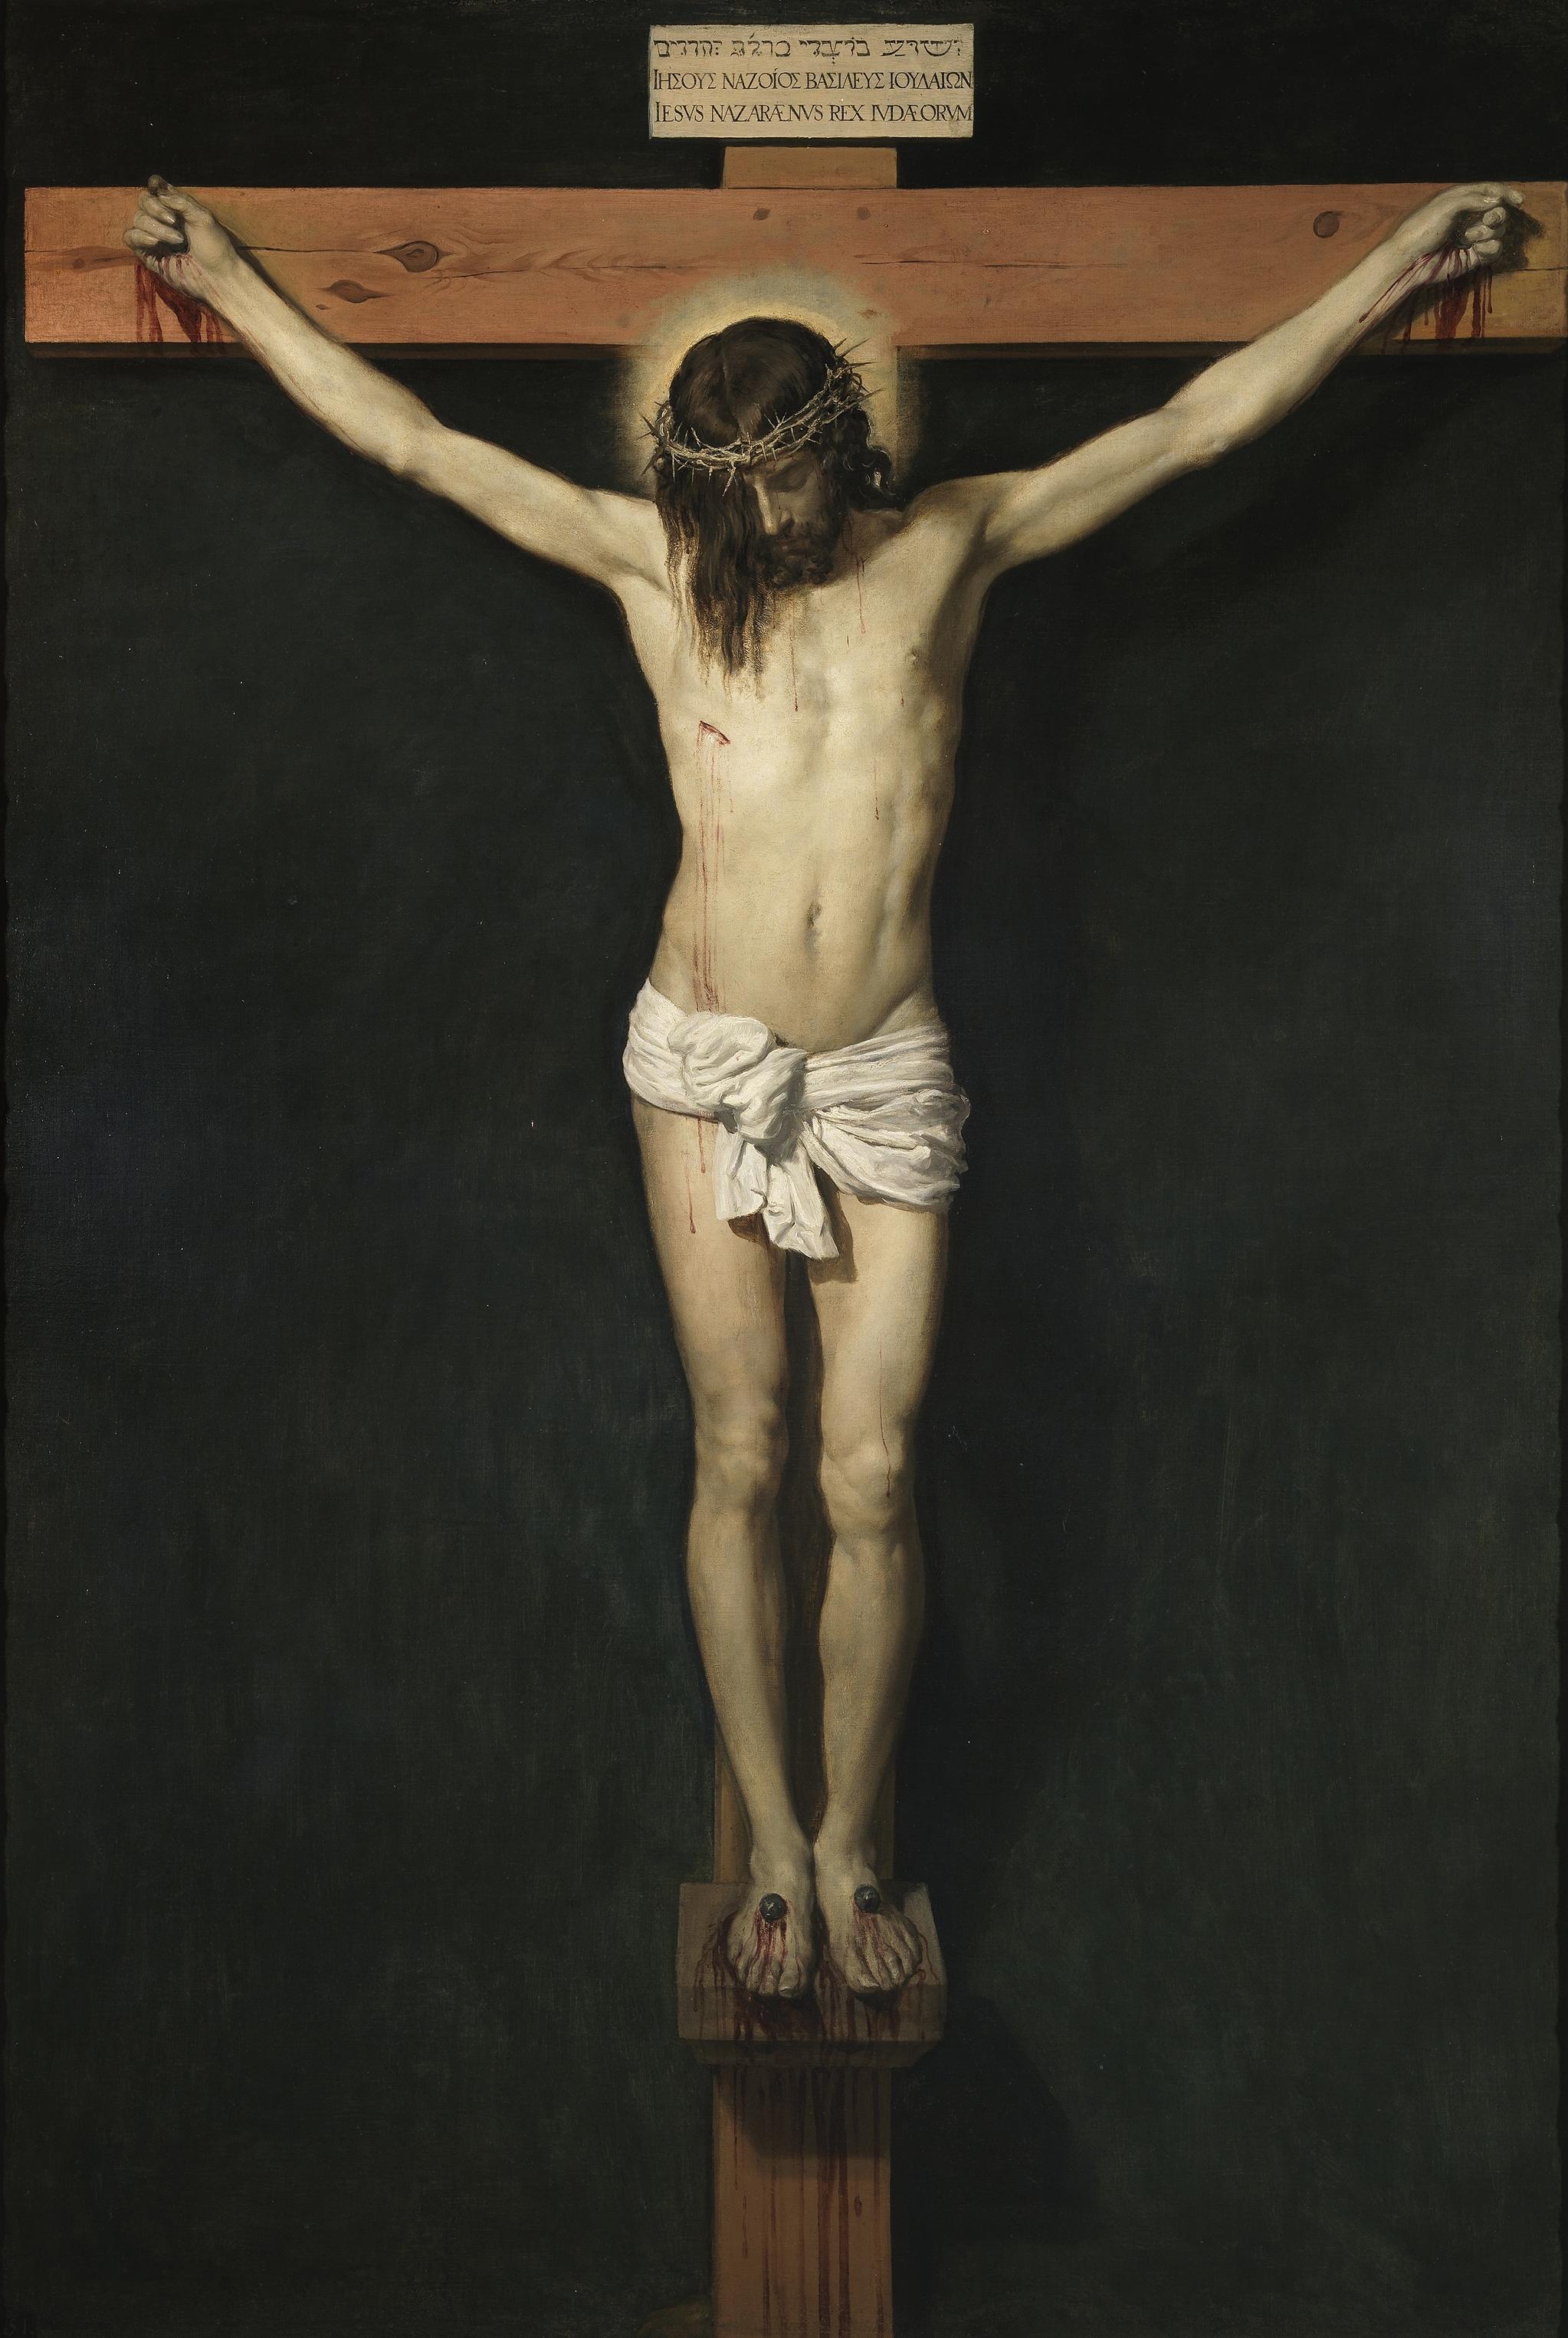 crucifixion of jesus - wikipedia